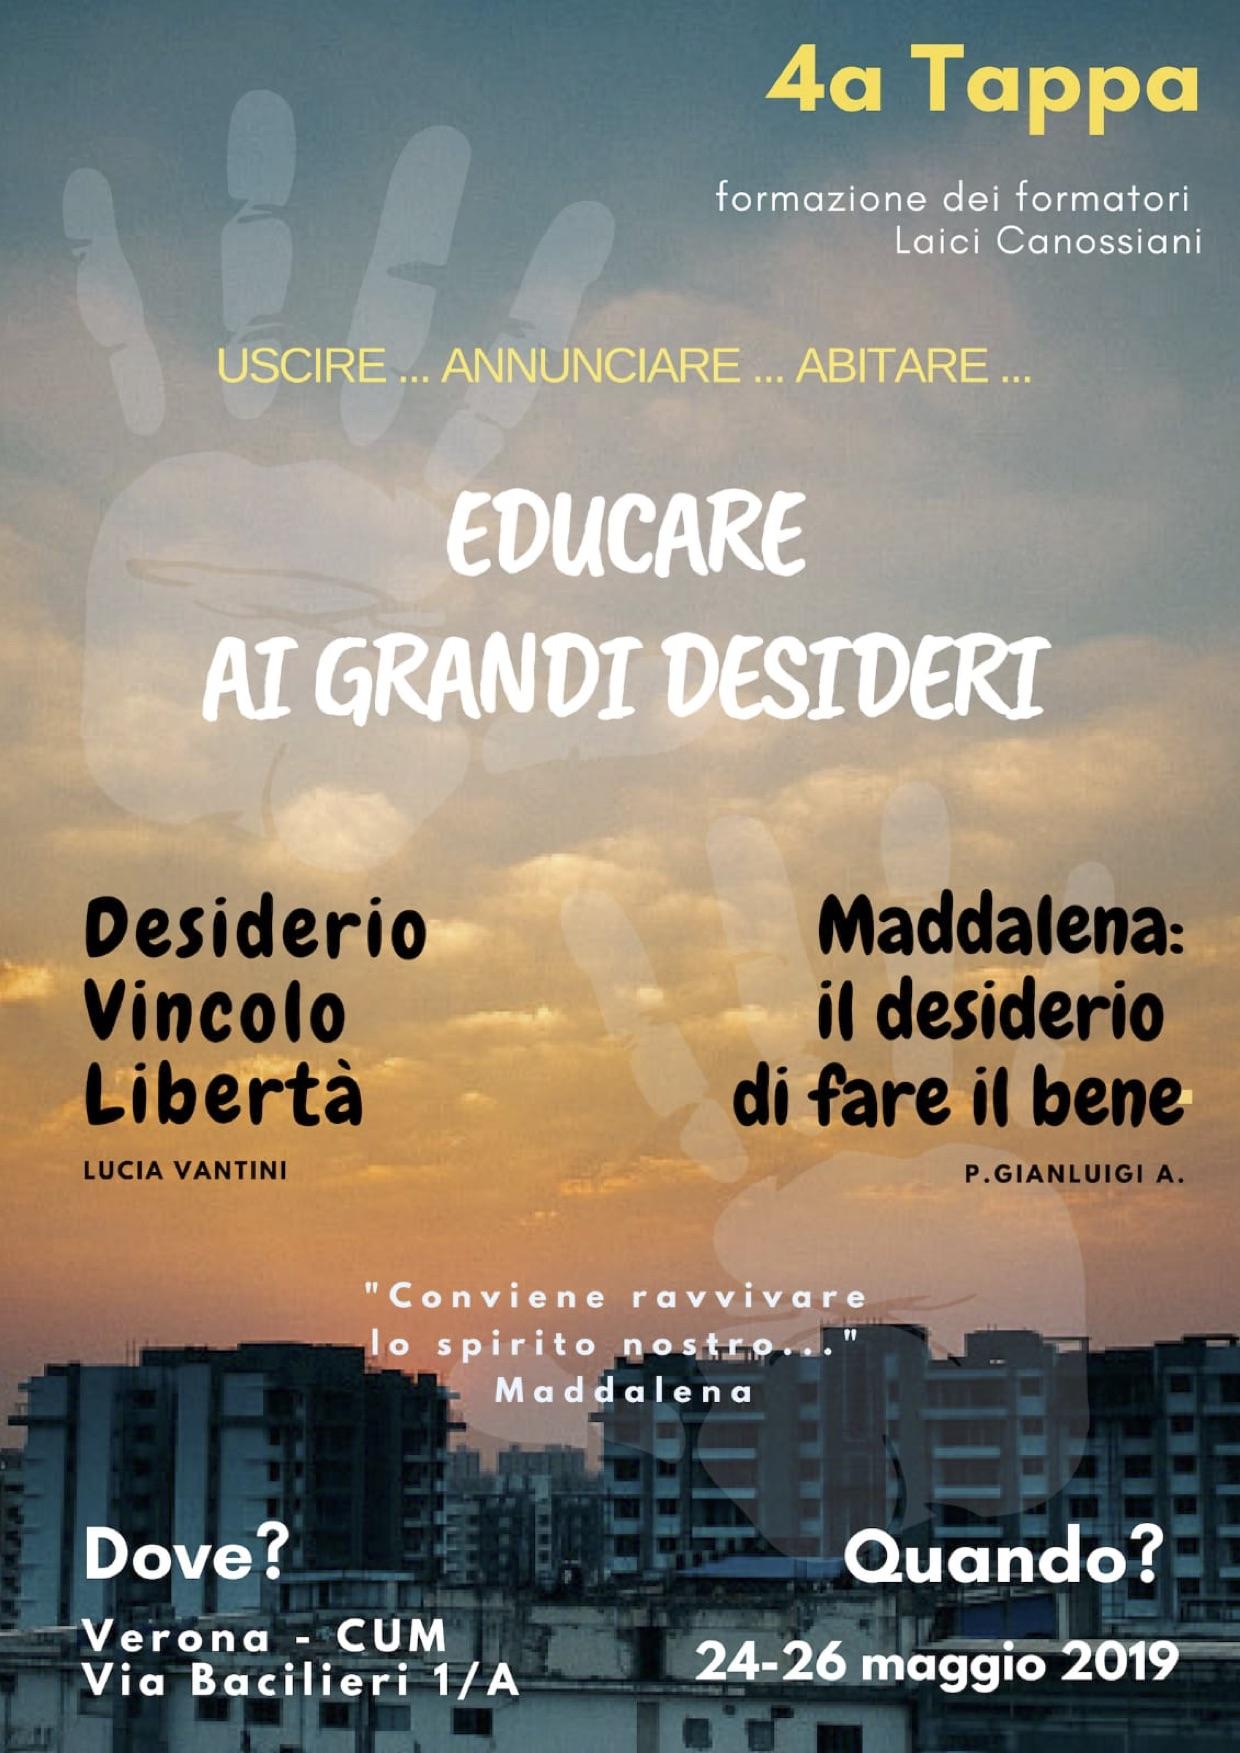 24-26.05.2019, VERONA: Educare ai grandi desideri @ CUM